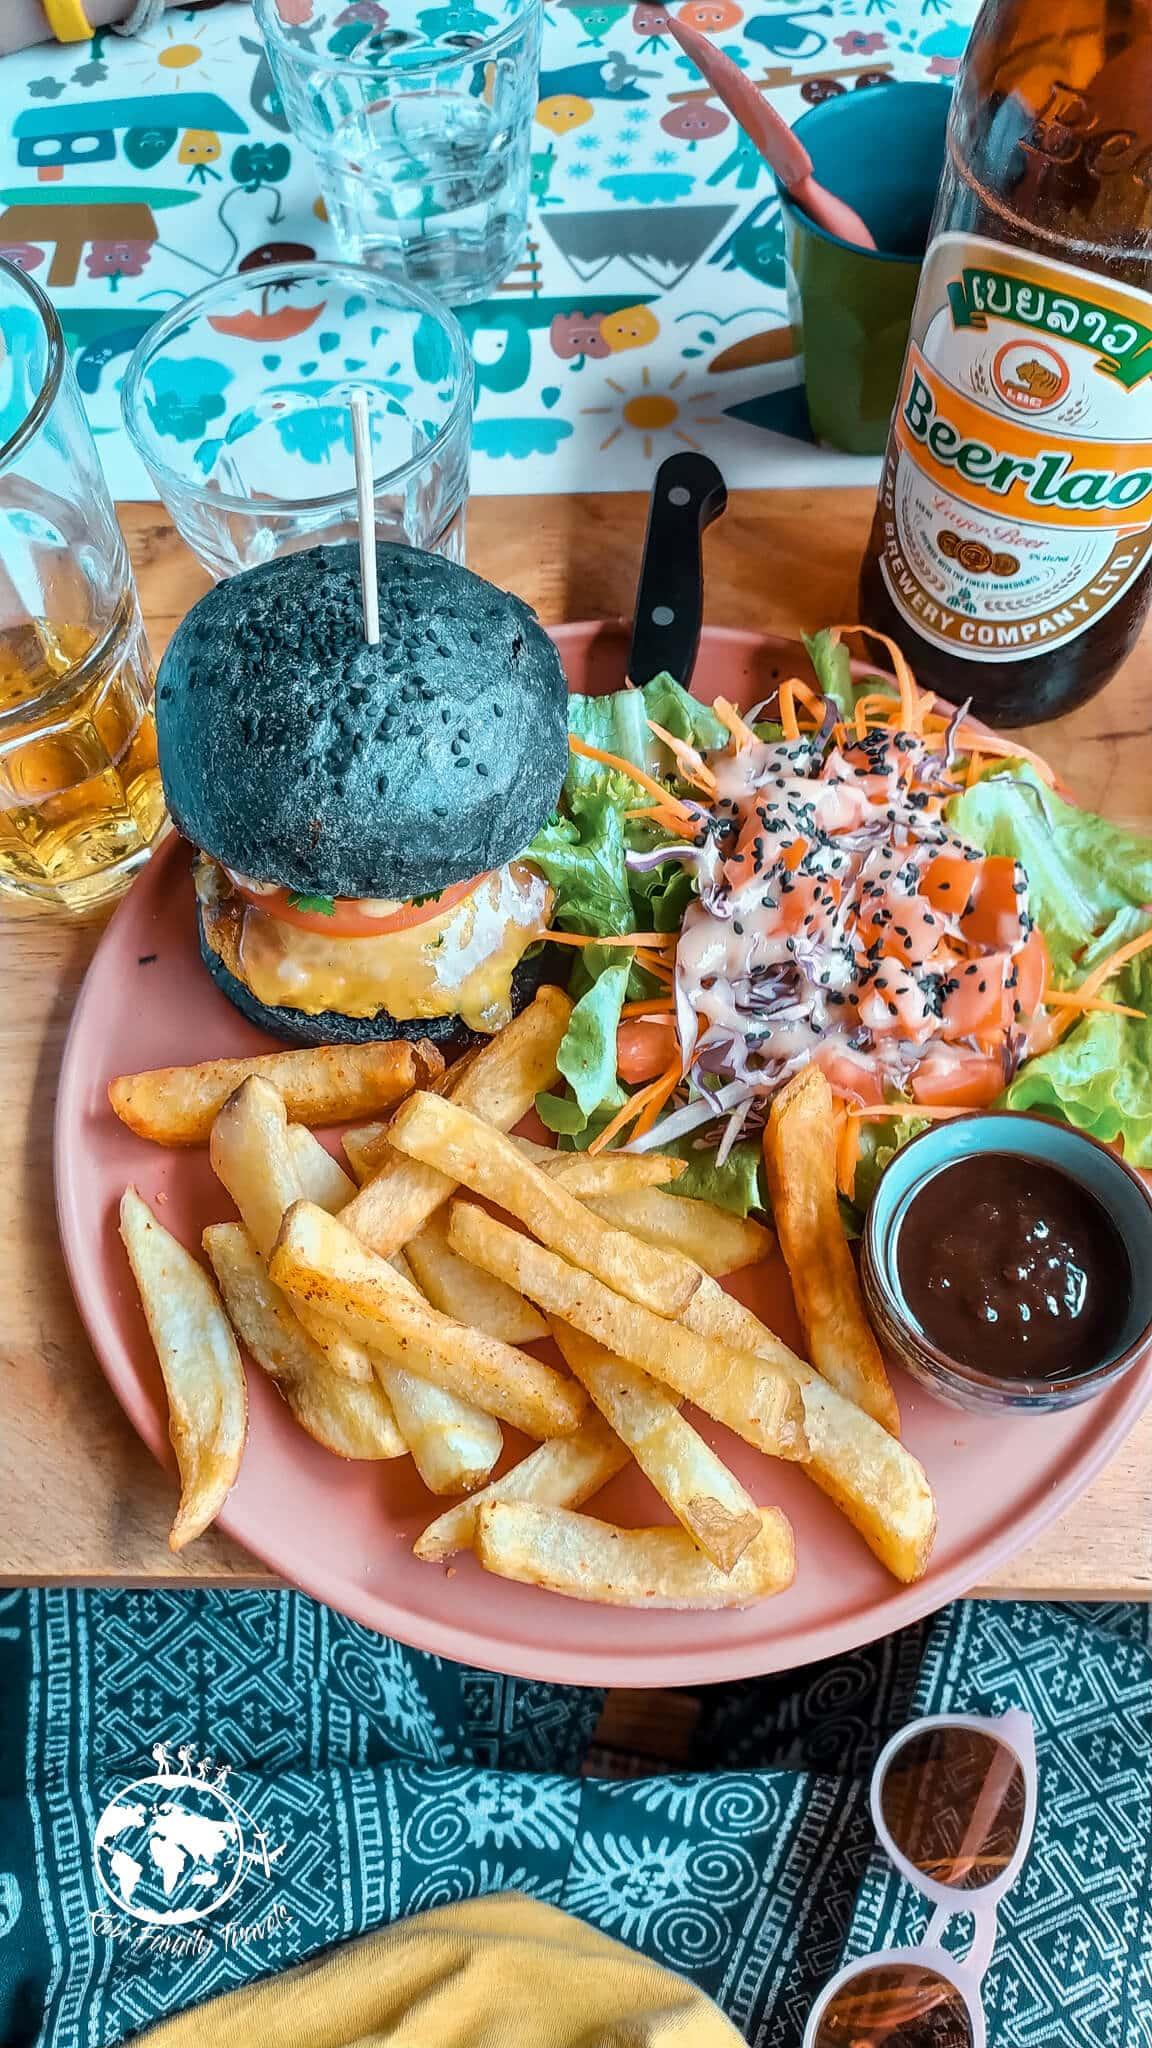 Hamburger du restaurant